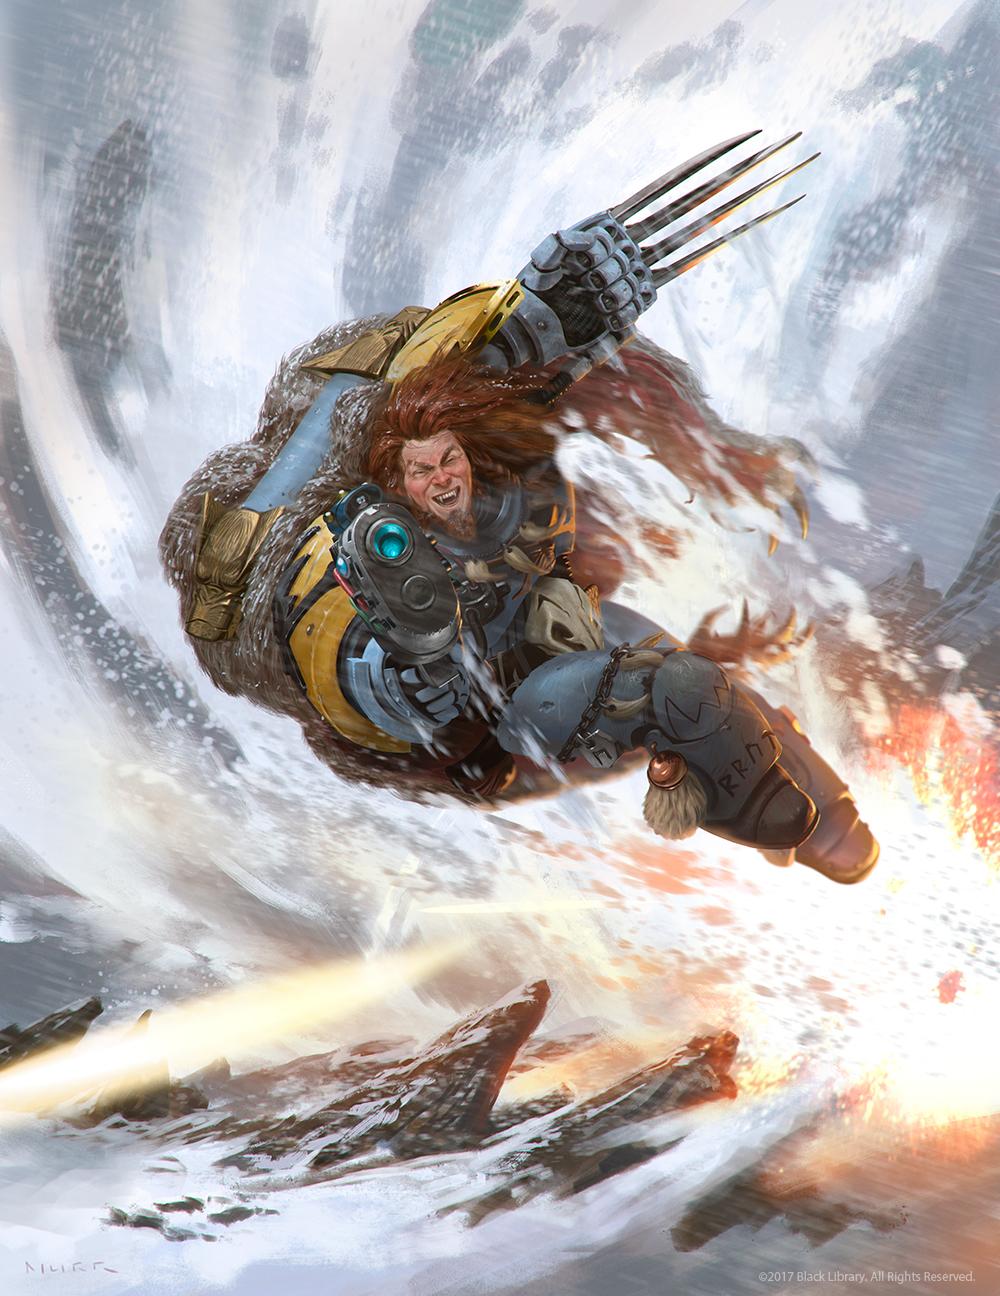 Warhammer 40K - Lukas the Trickster